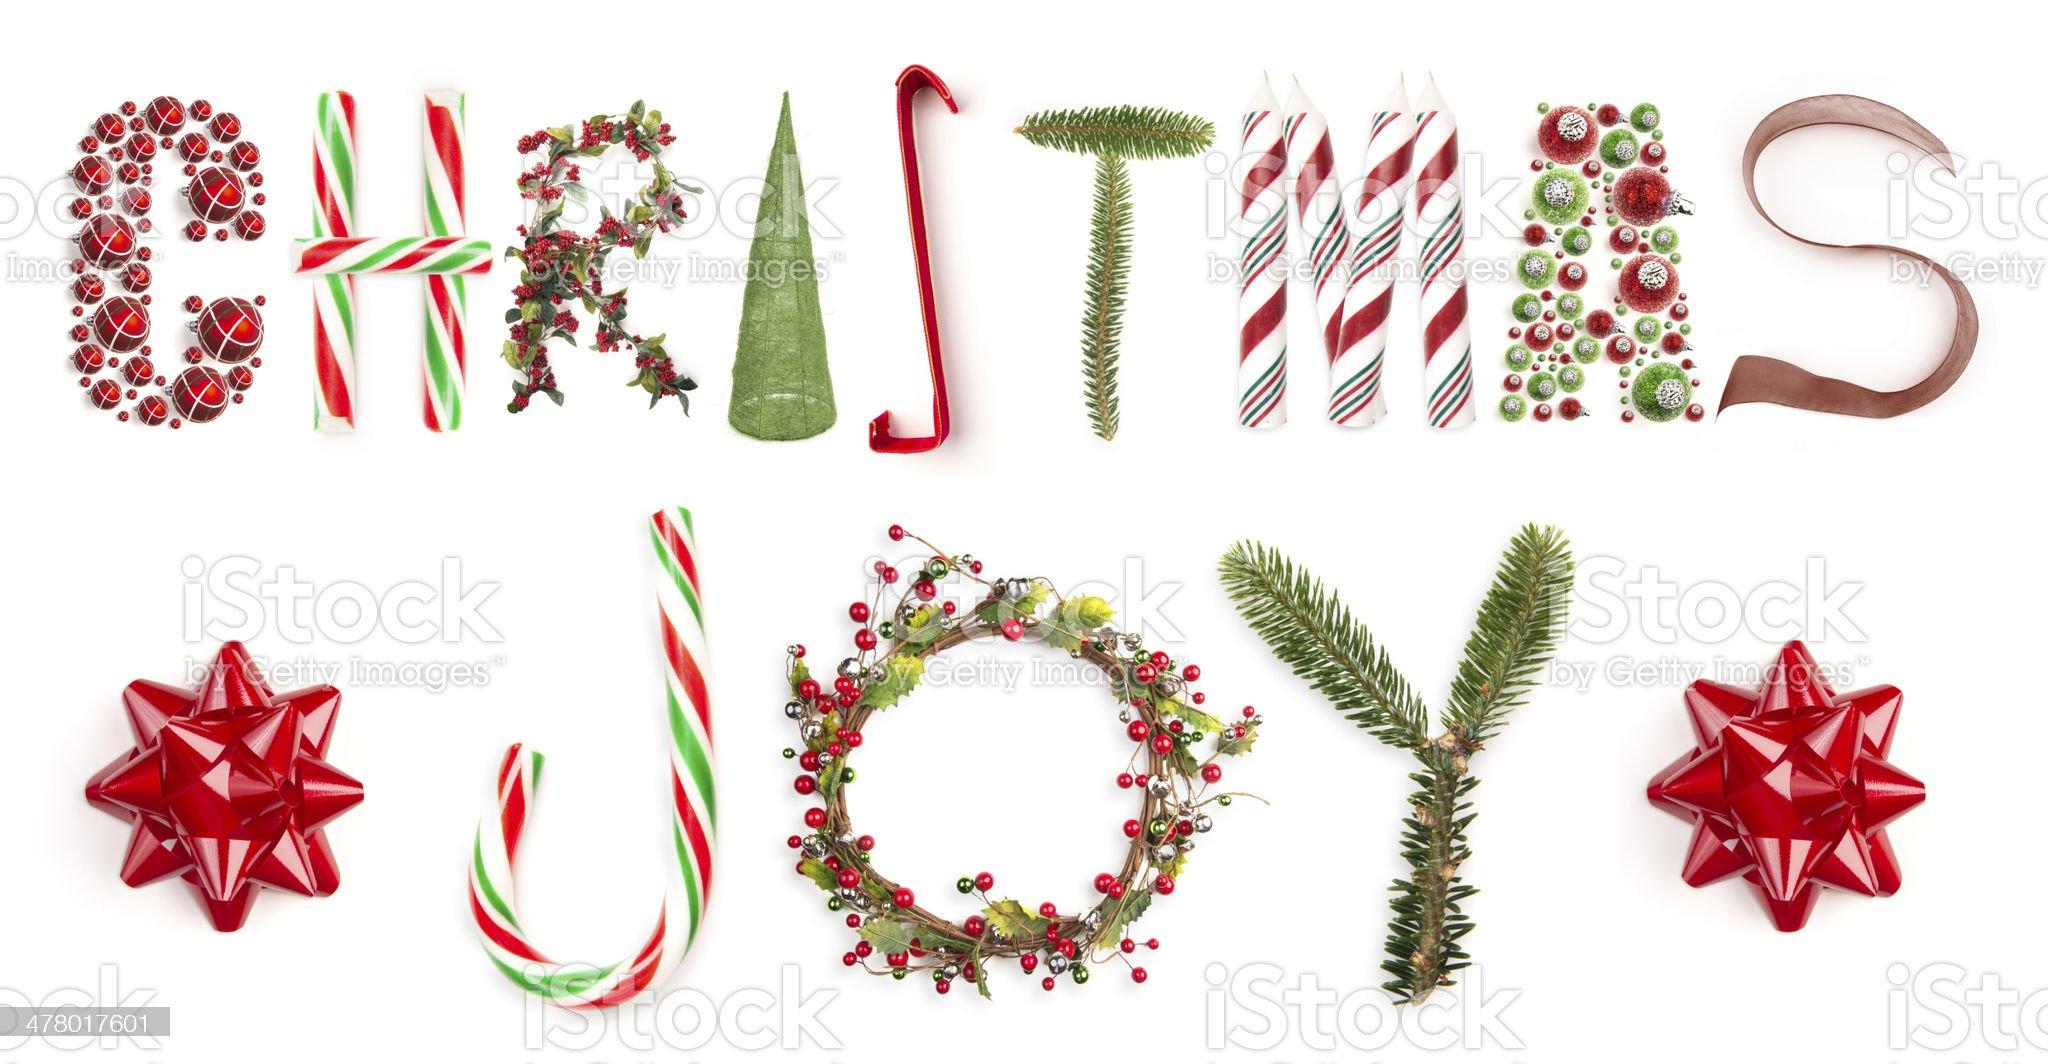 Christmas Joy royalty-free stock photo